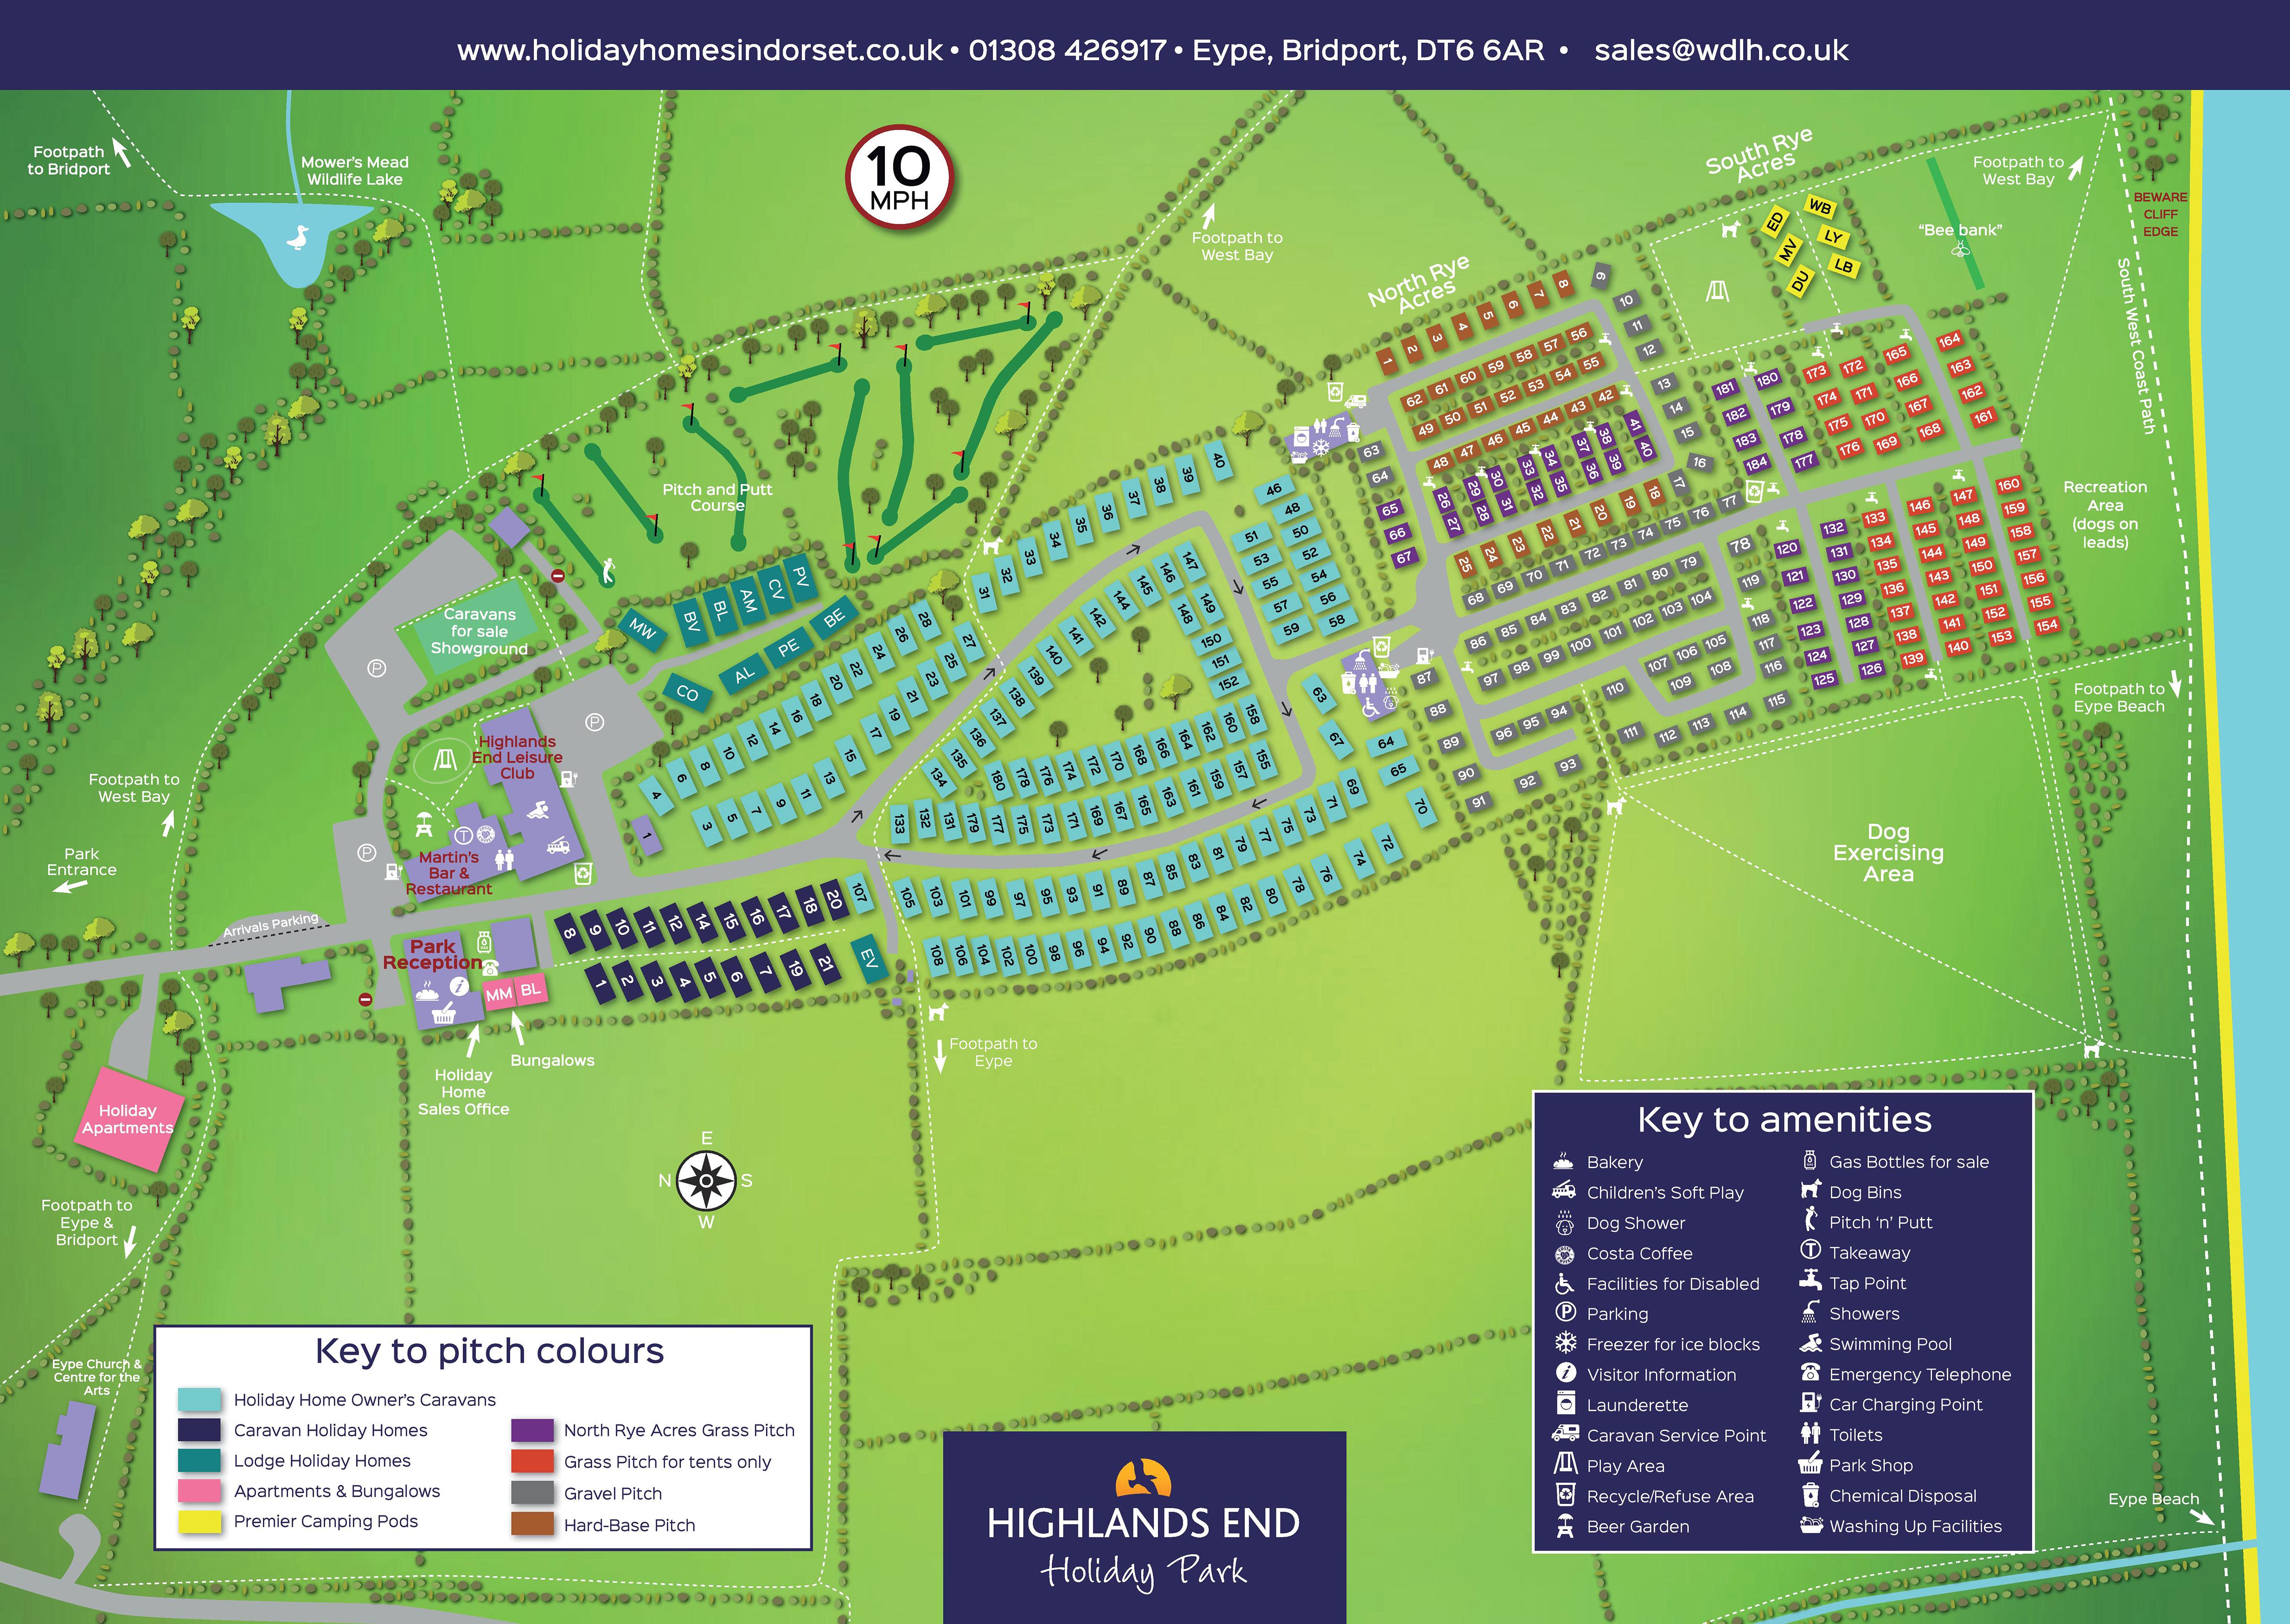 Download The Park Map For Highlands End Holiday Park